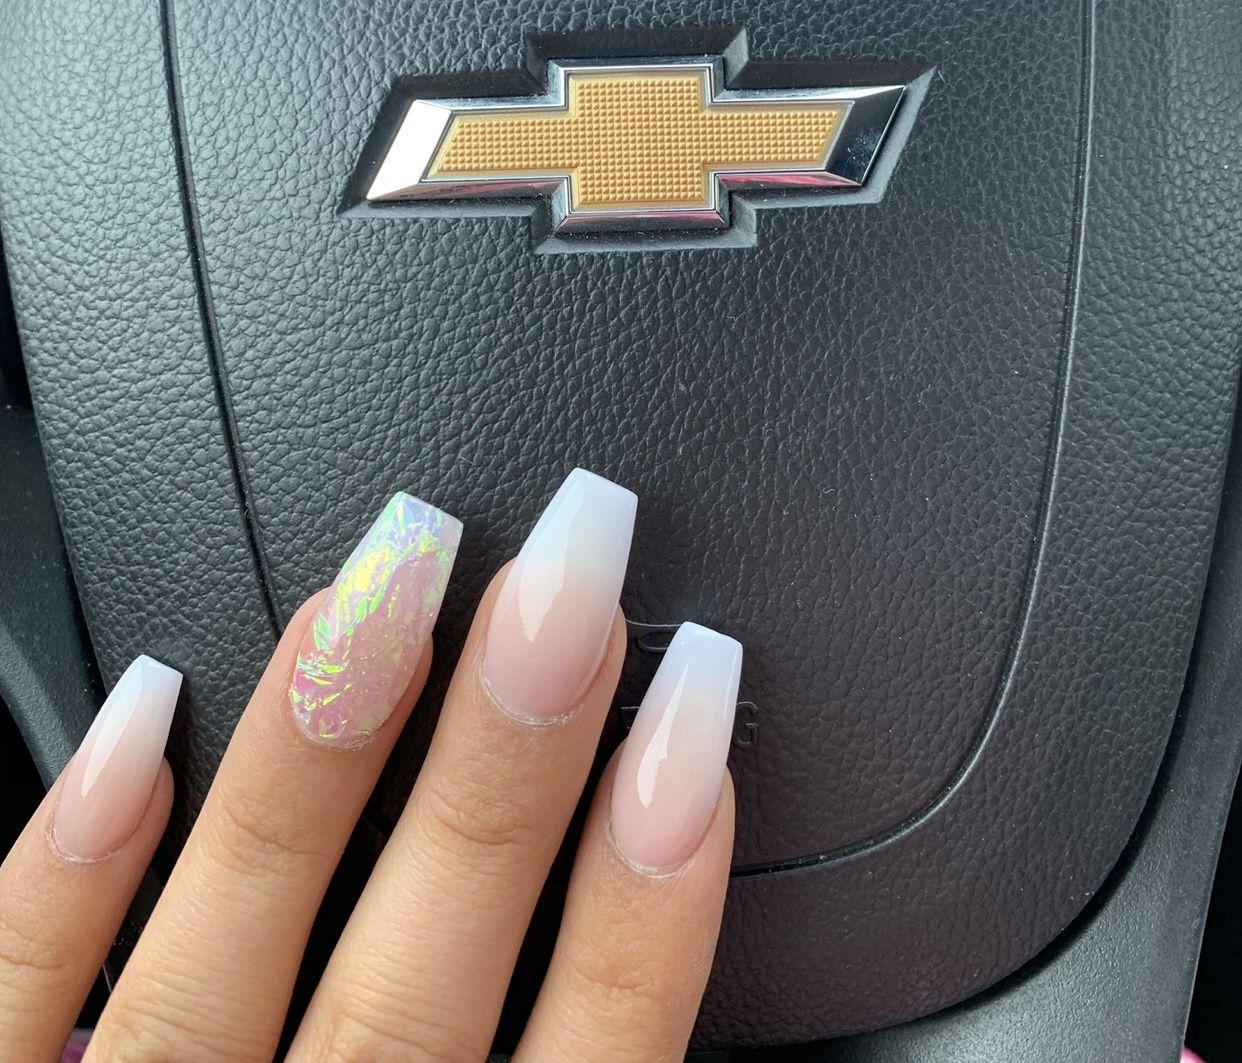 Ombre Iridescent Acrylic Nails Acrylicnails Ombre Coffin Coffinnails Irridescent Nails Nails Acrylic Nails